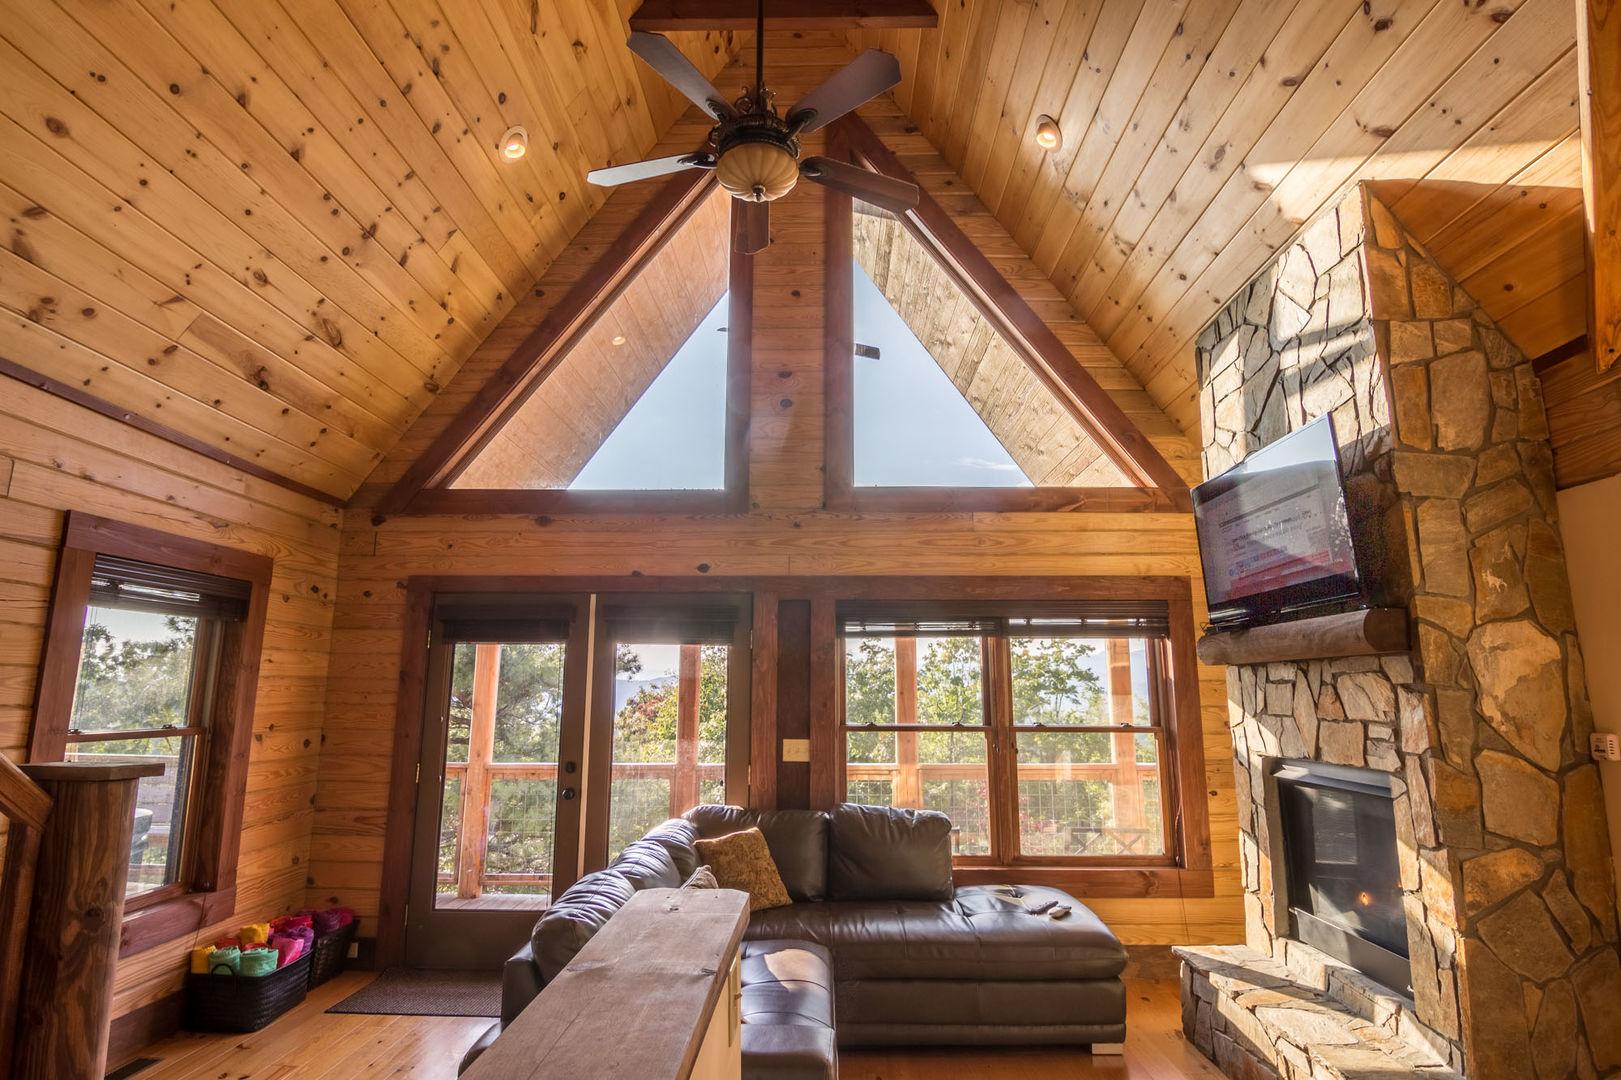 Living room with beautiful windows.